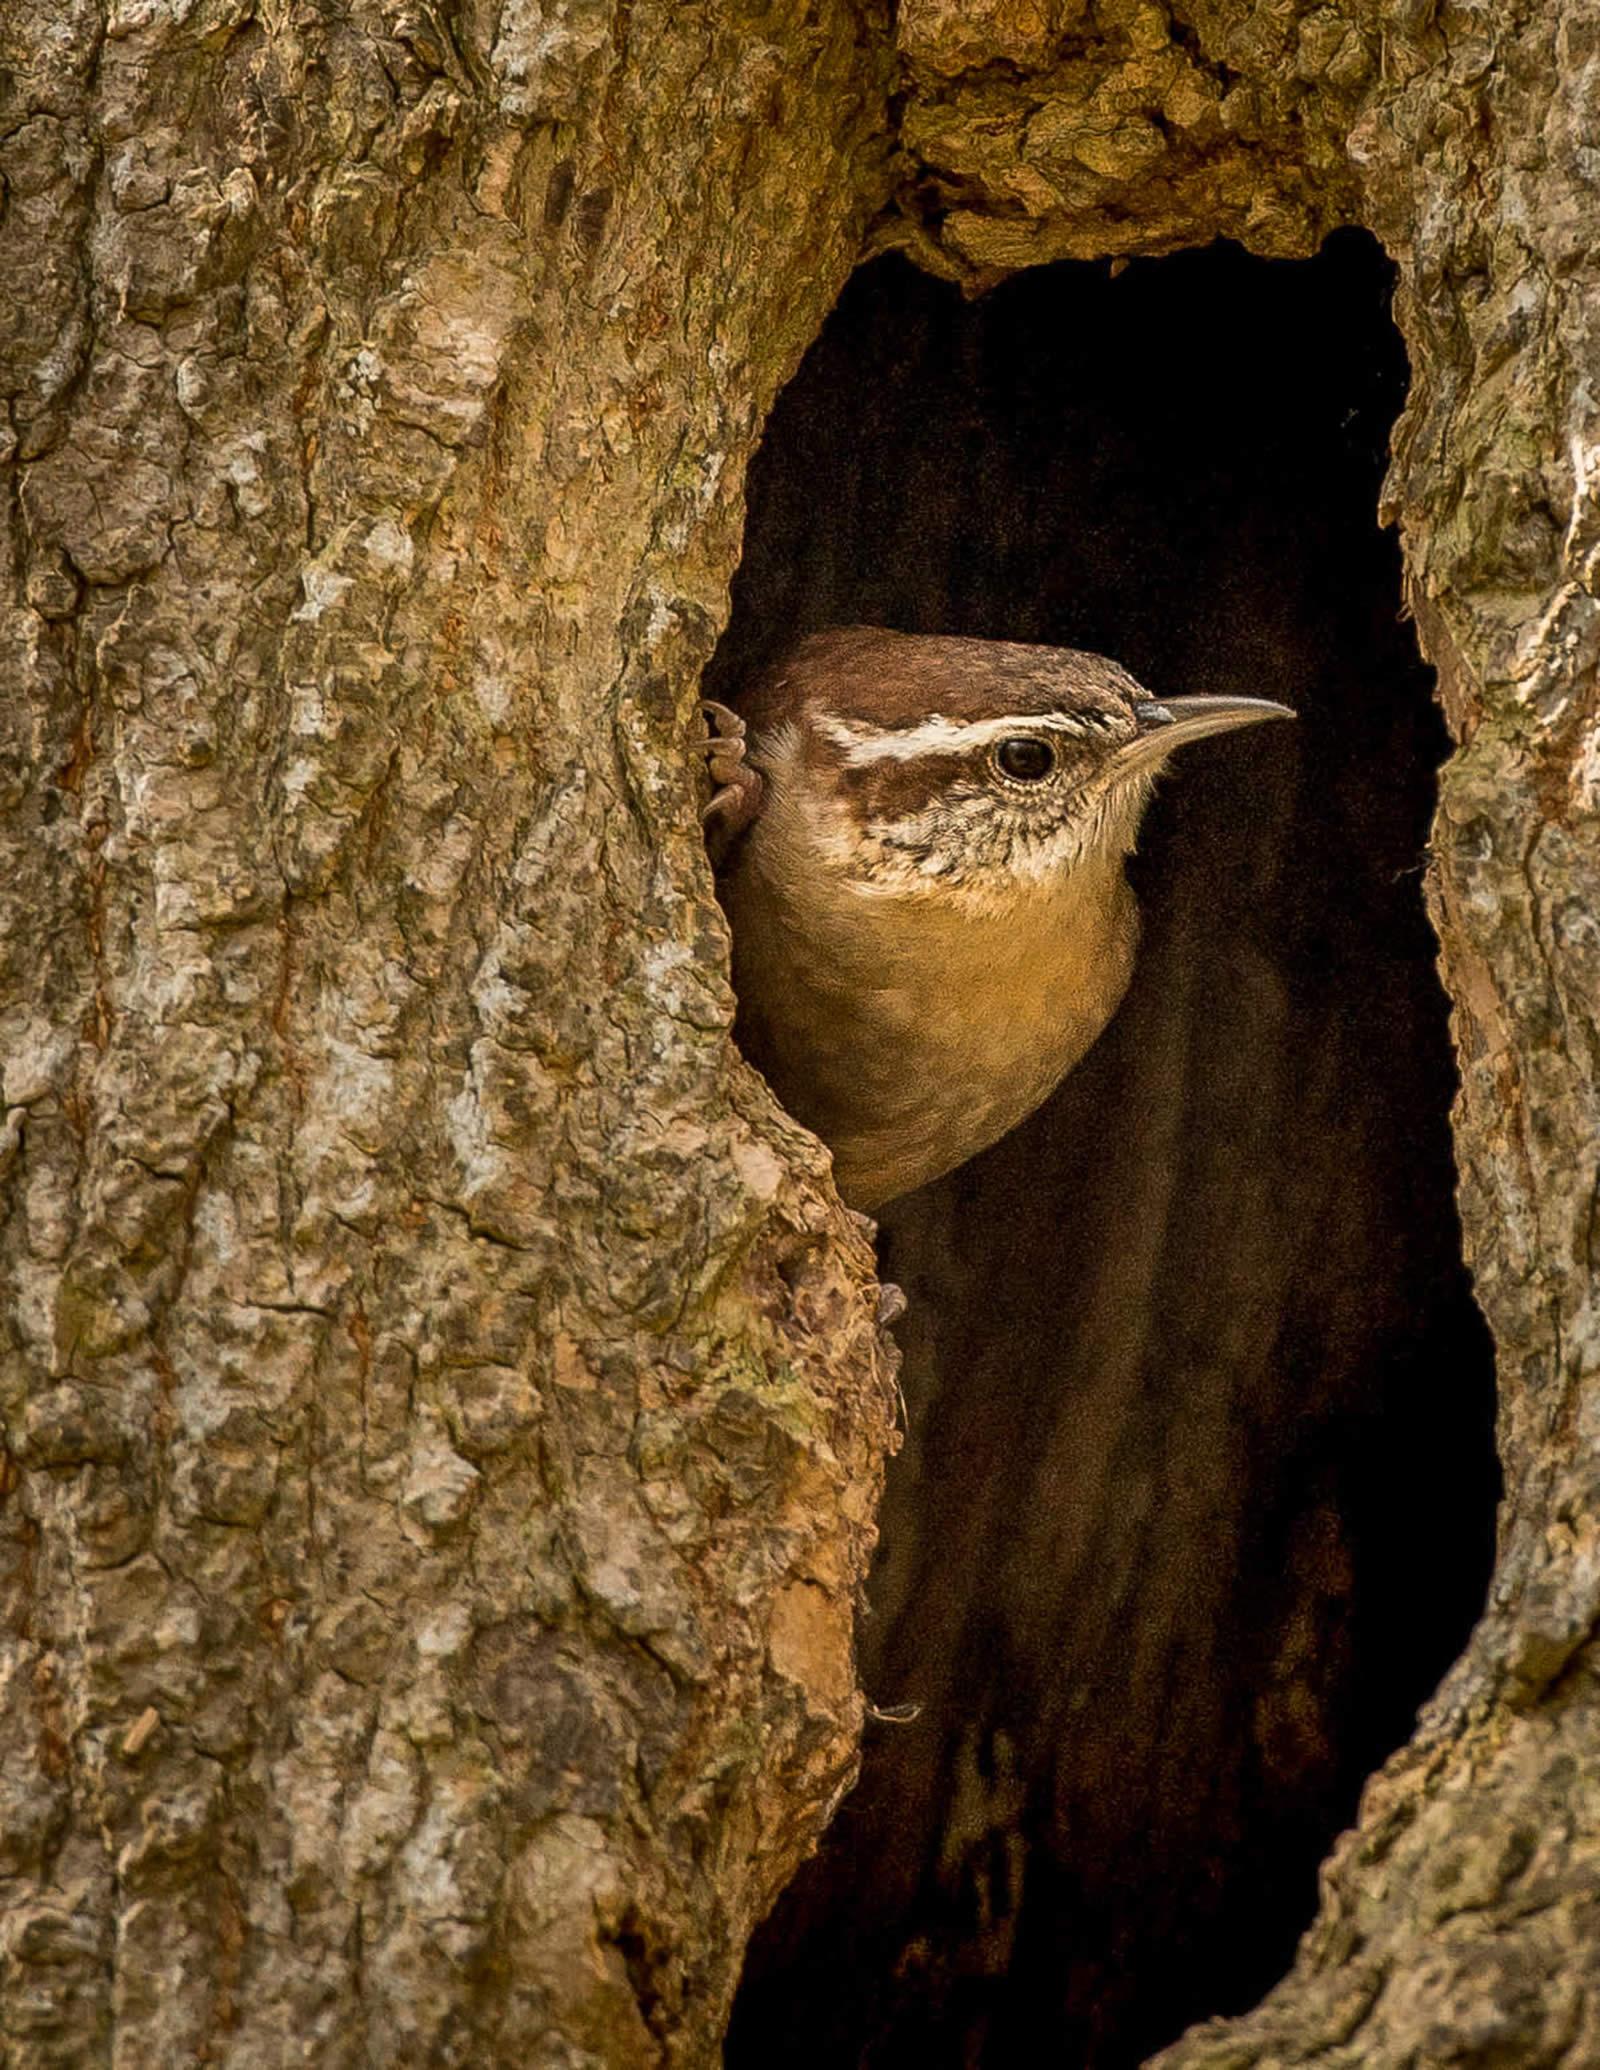 Michael Schmitt / Audubon Photography Awards